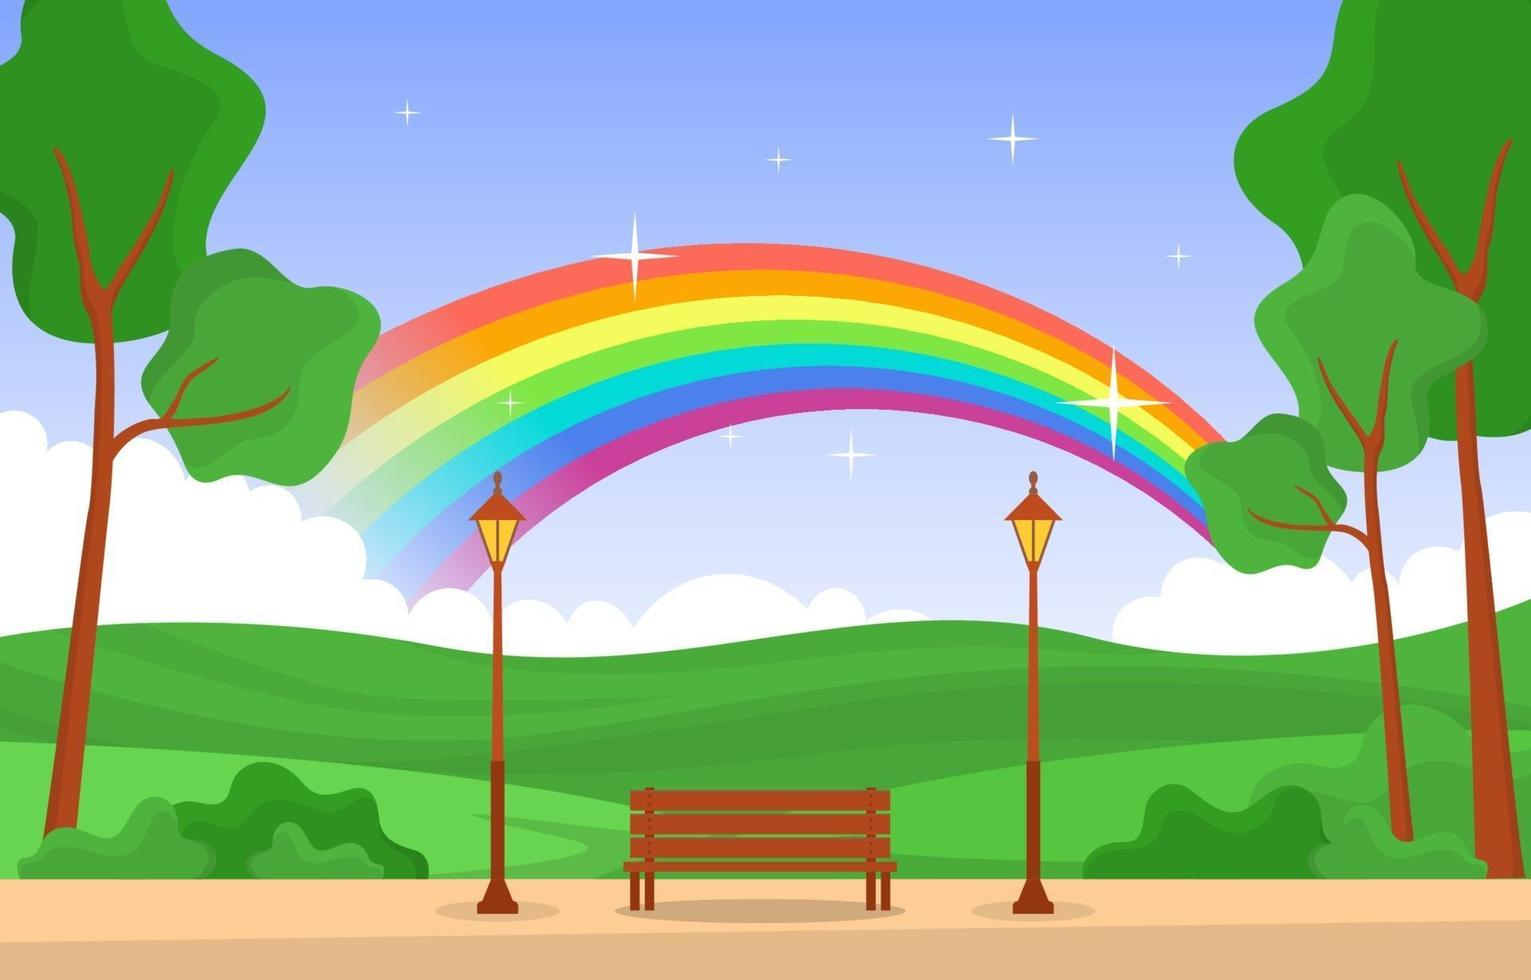 Beautiful Rainbow in Park Summer Nature Landscape Illustration vector